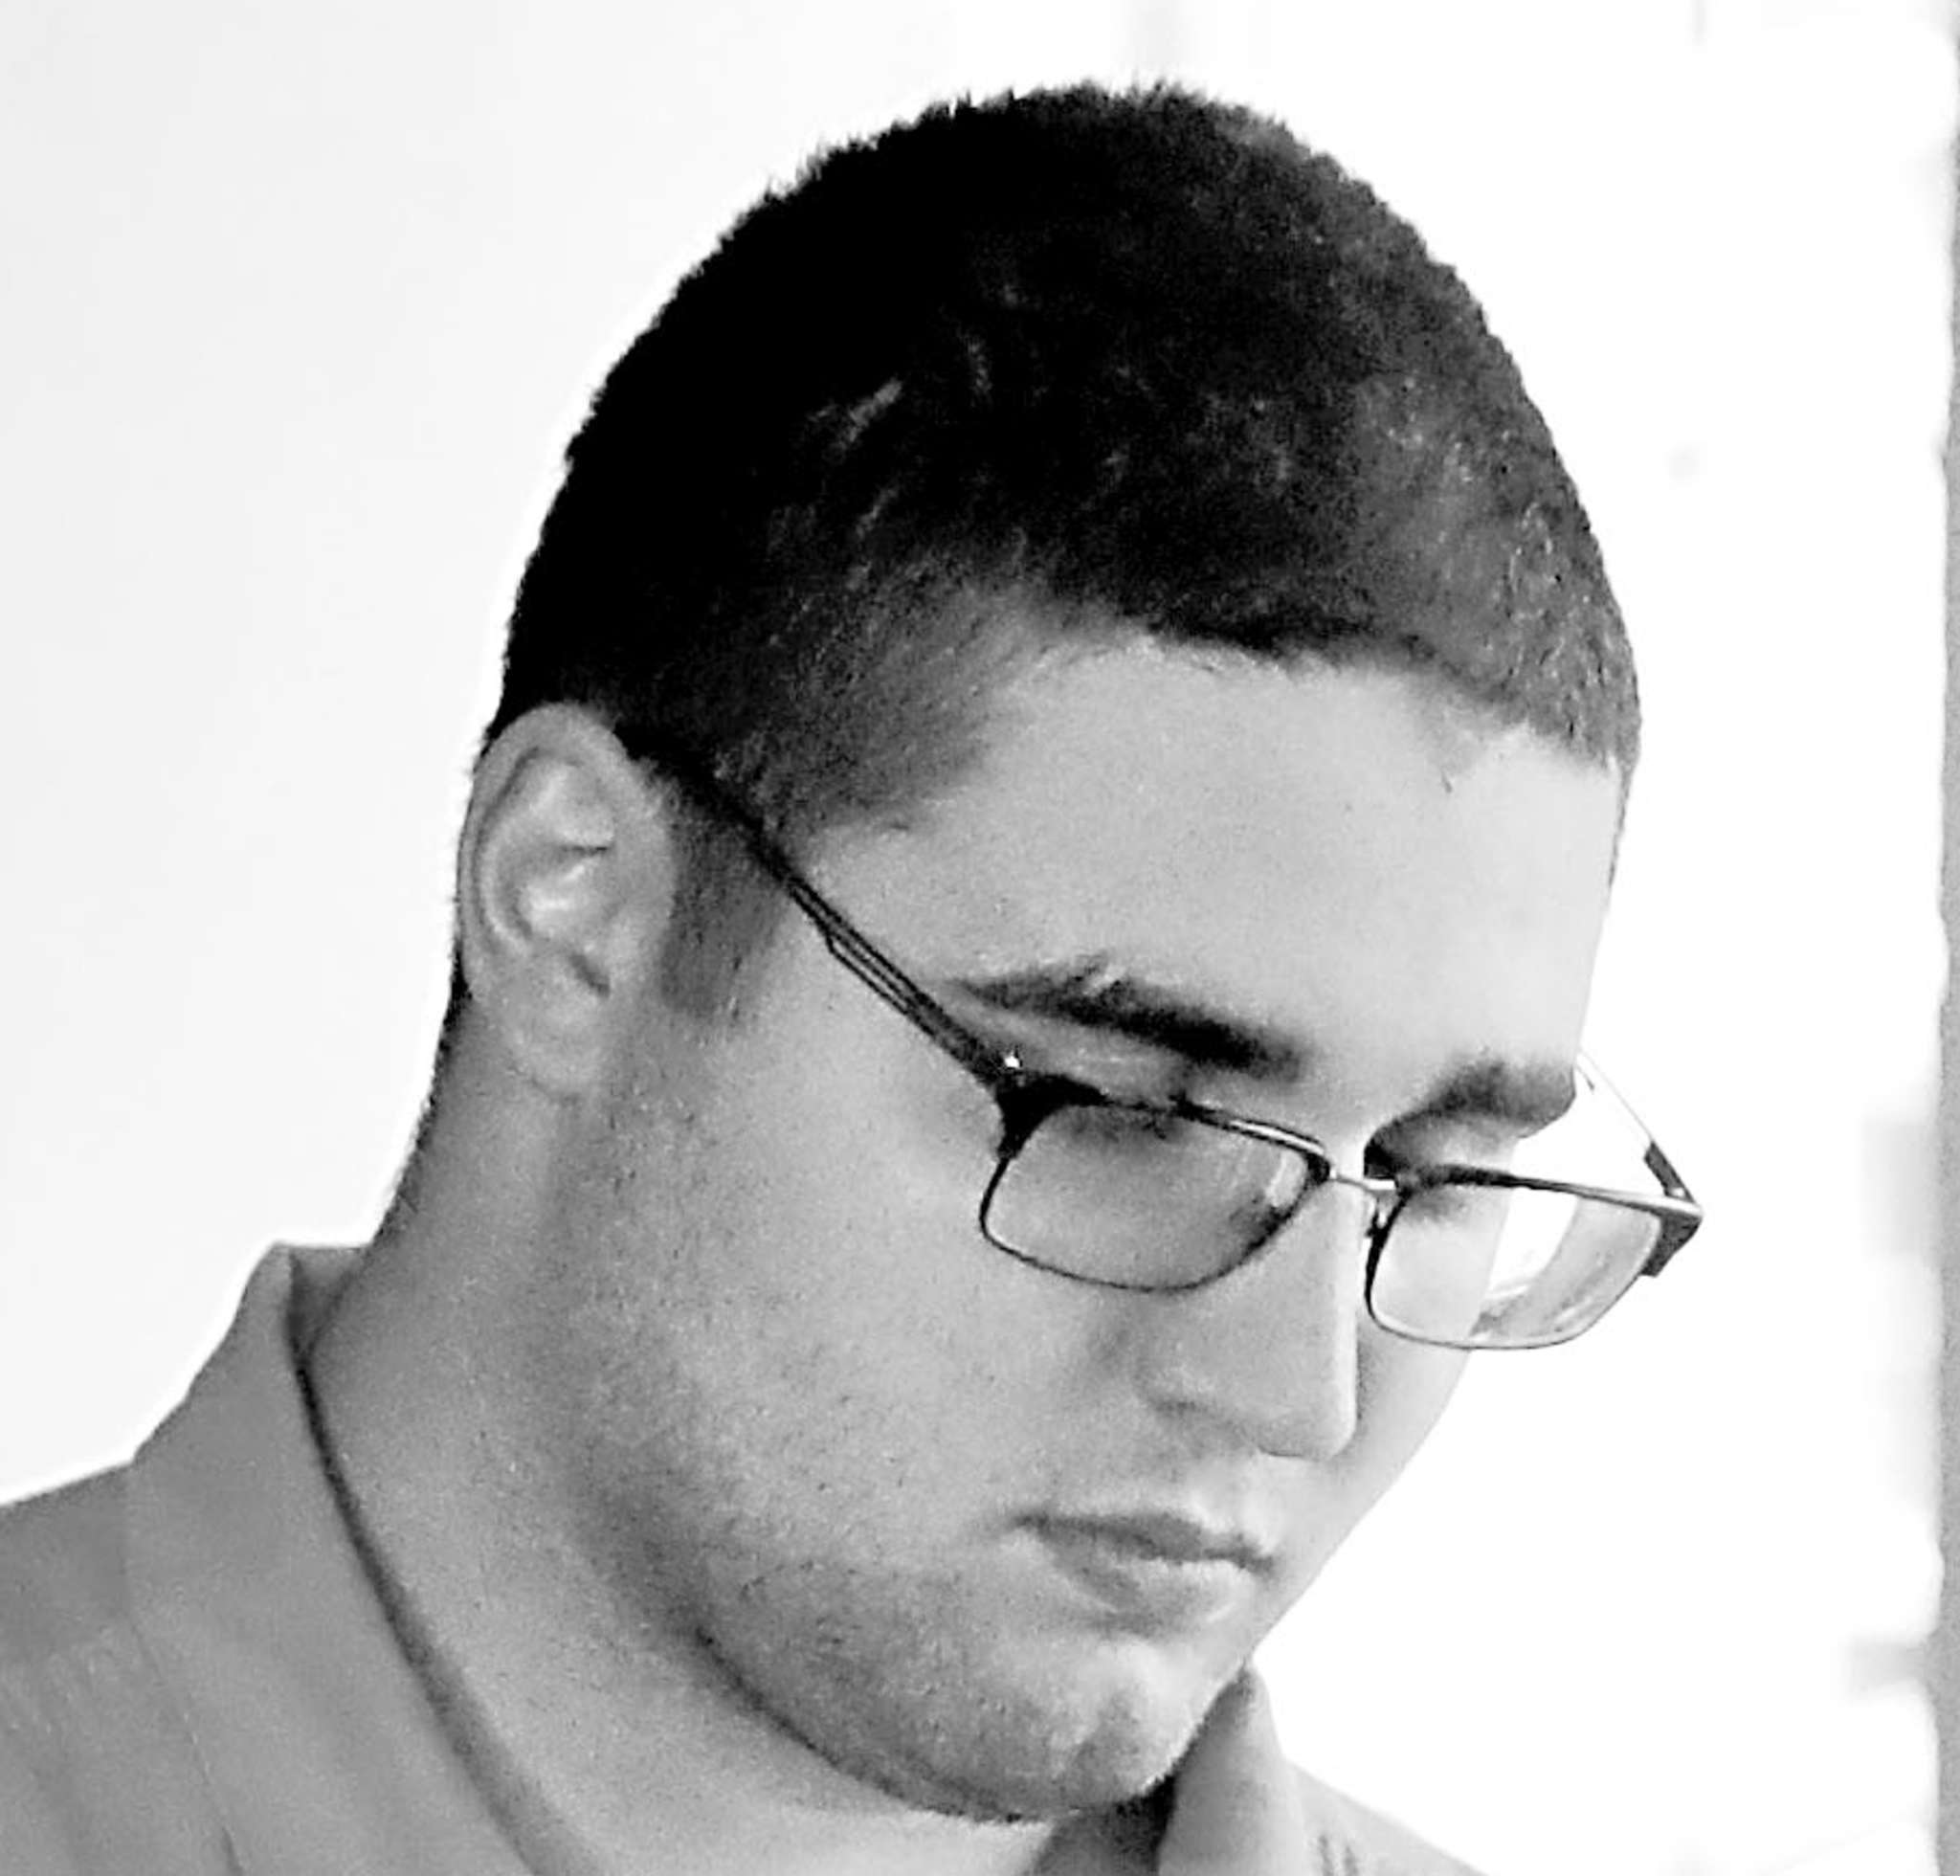 Confessed killer Cosmo DiNardo